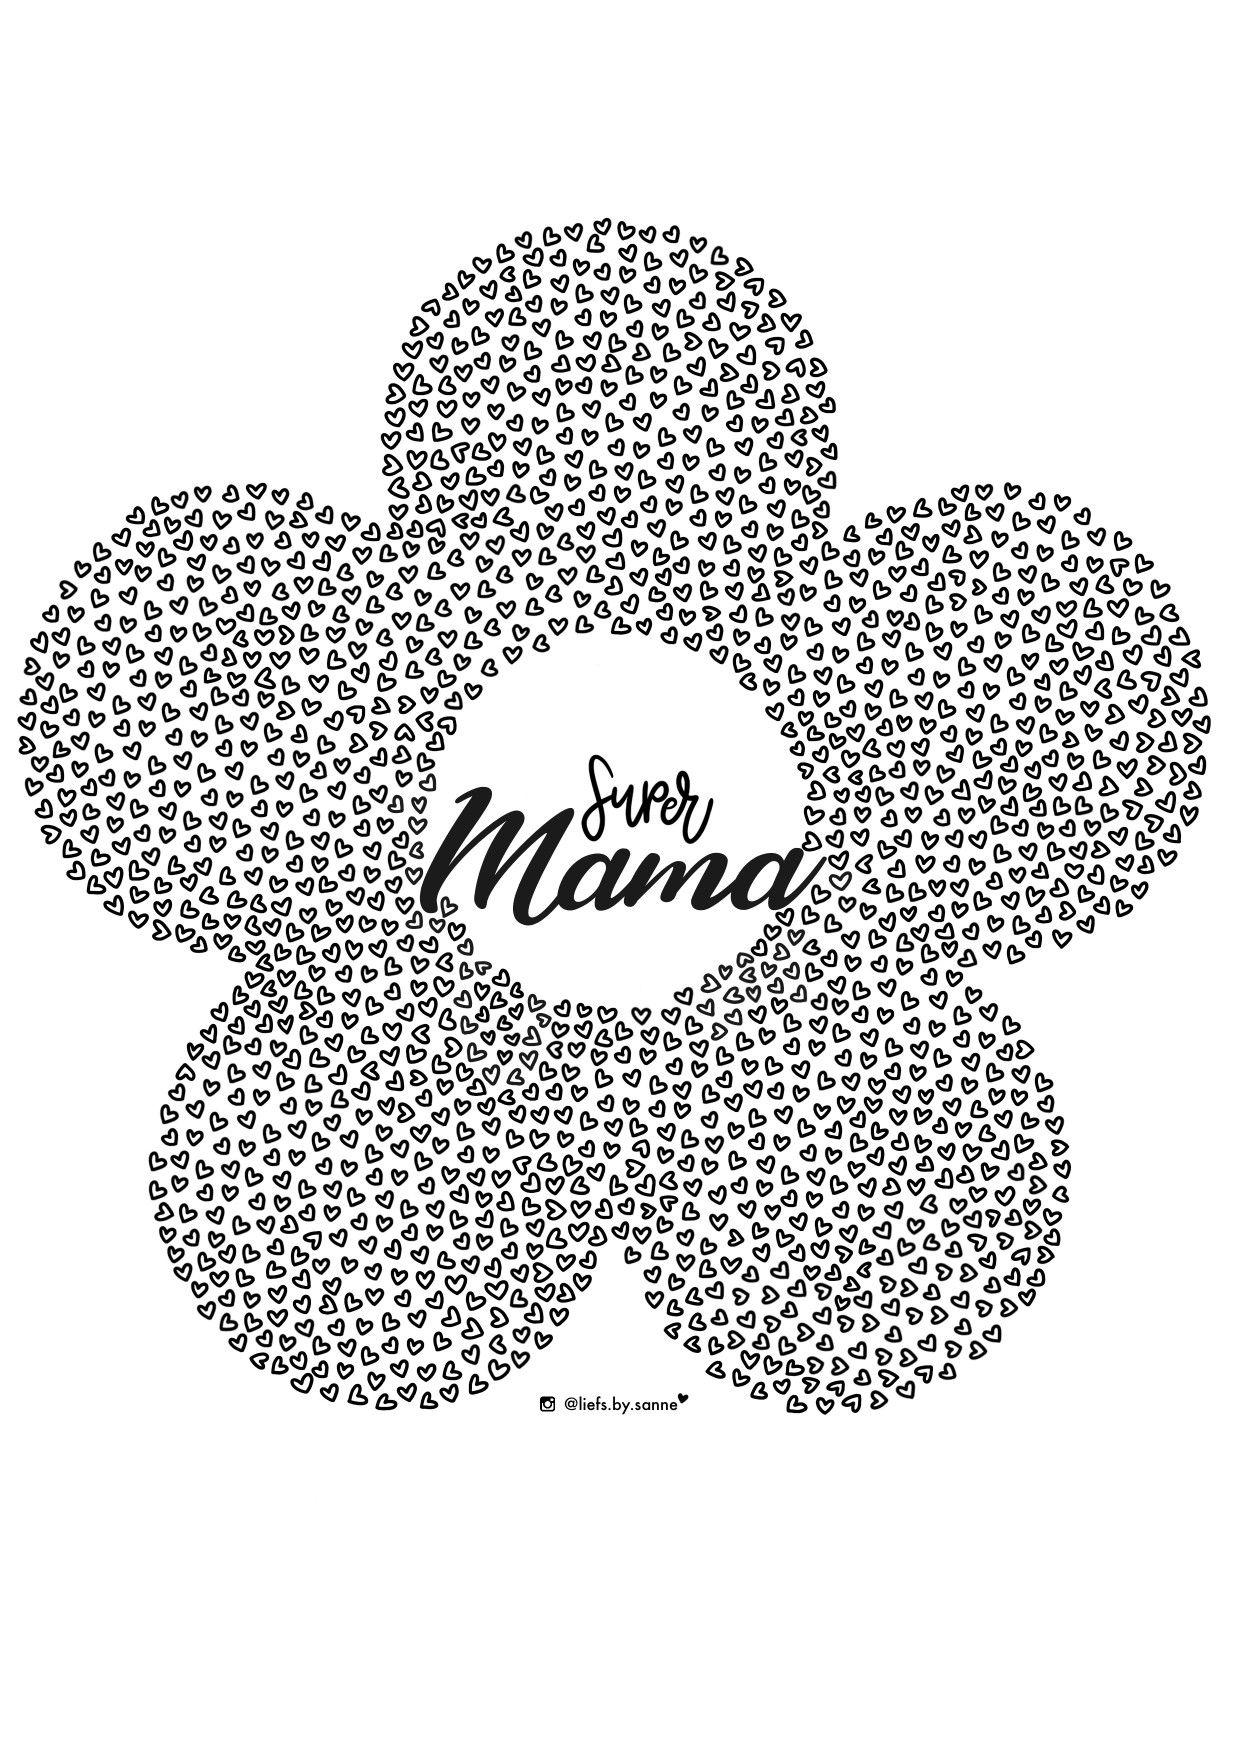 Super Mama Moederdag Kleurplaat Moederdag Knutselen Kleurplaten Moederdag